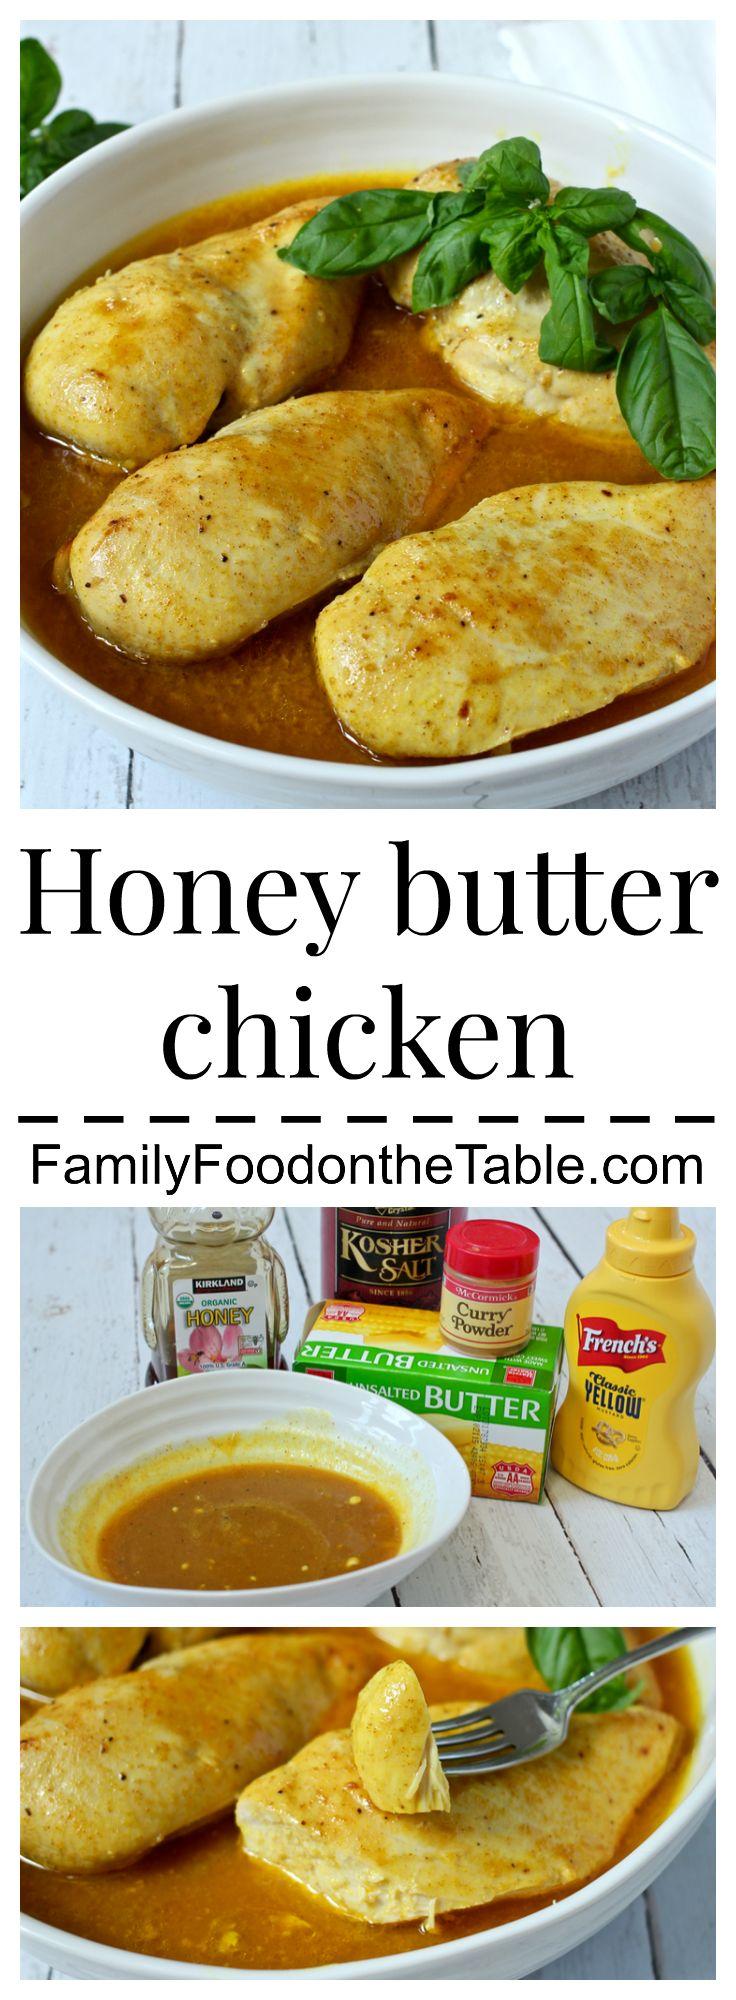 Honey butter chicken is an easy, hands-off, family-friendly dinner   FamilyFoodontheTable.com